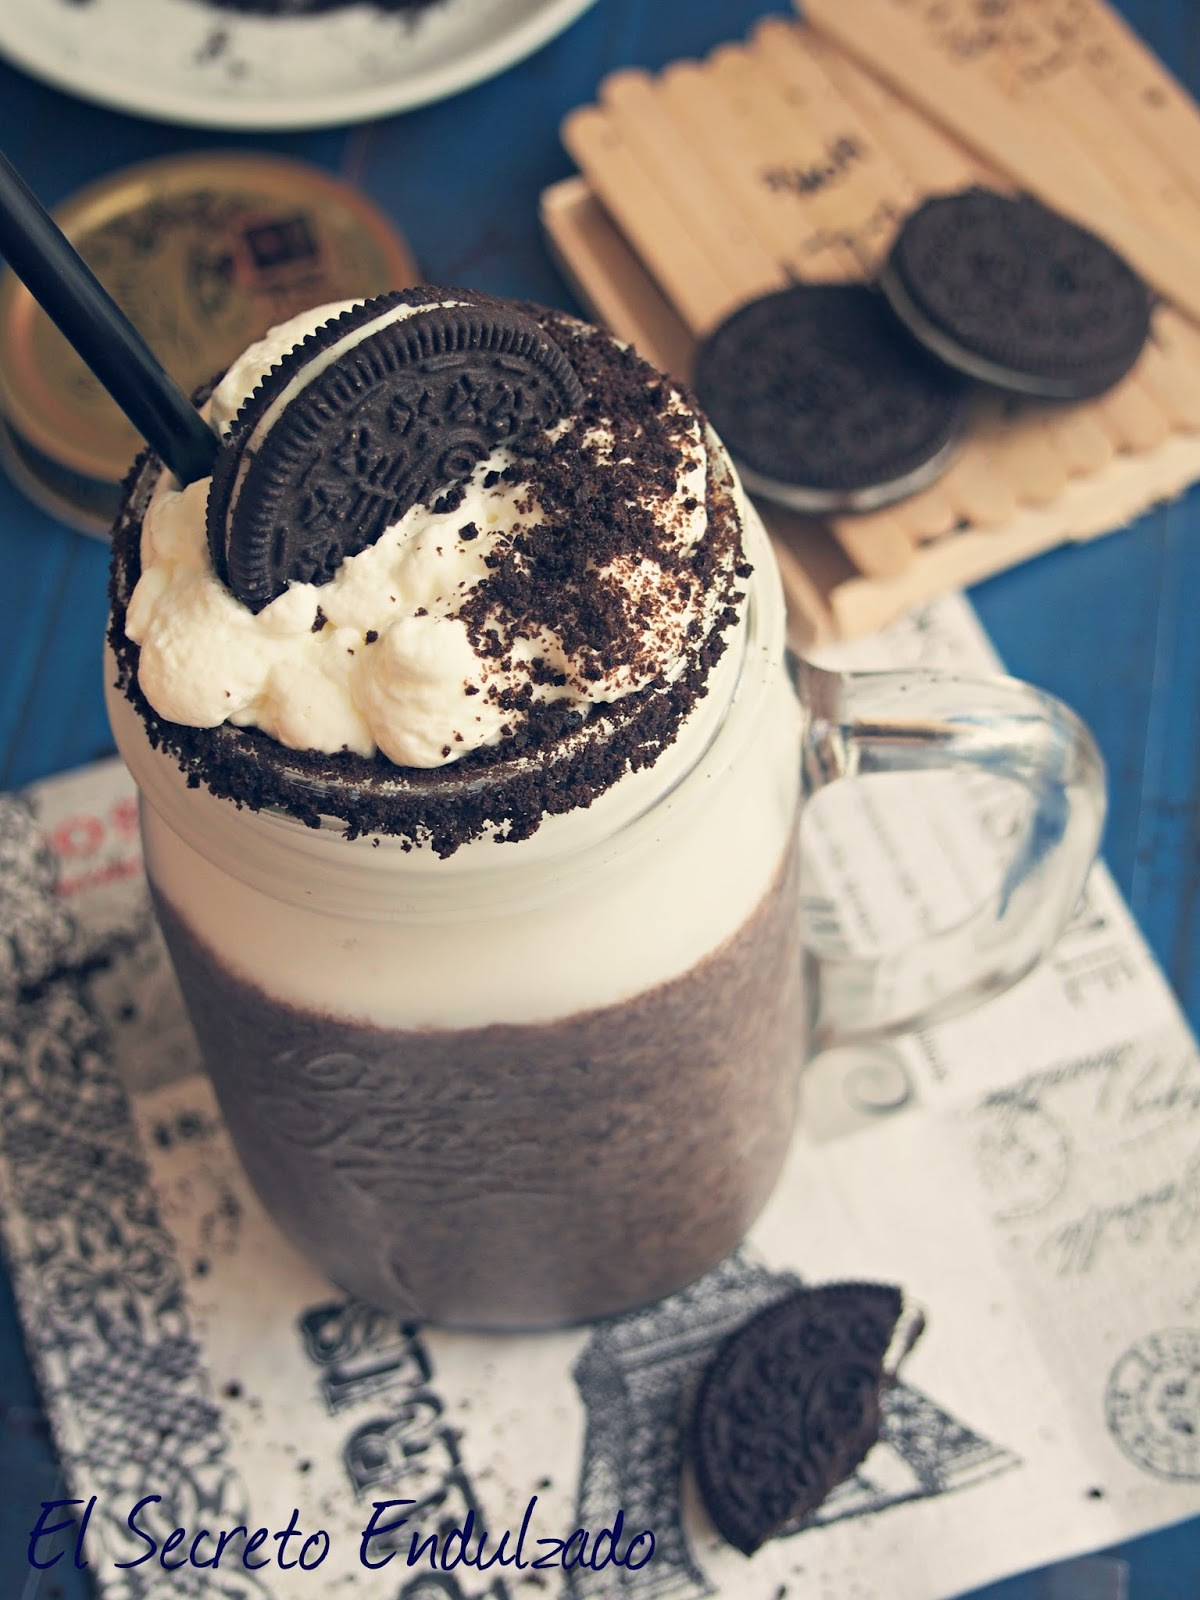 Al rico chocolate - 2 2